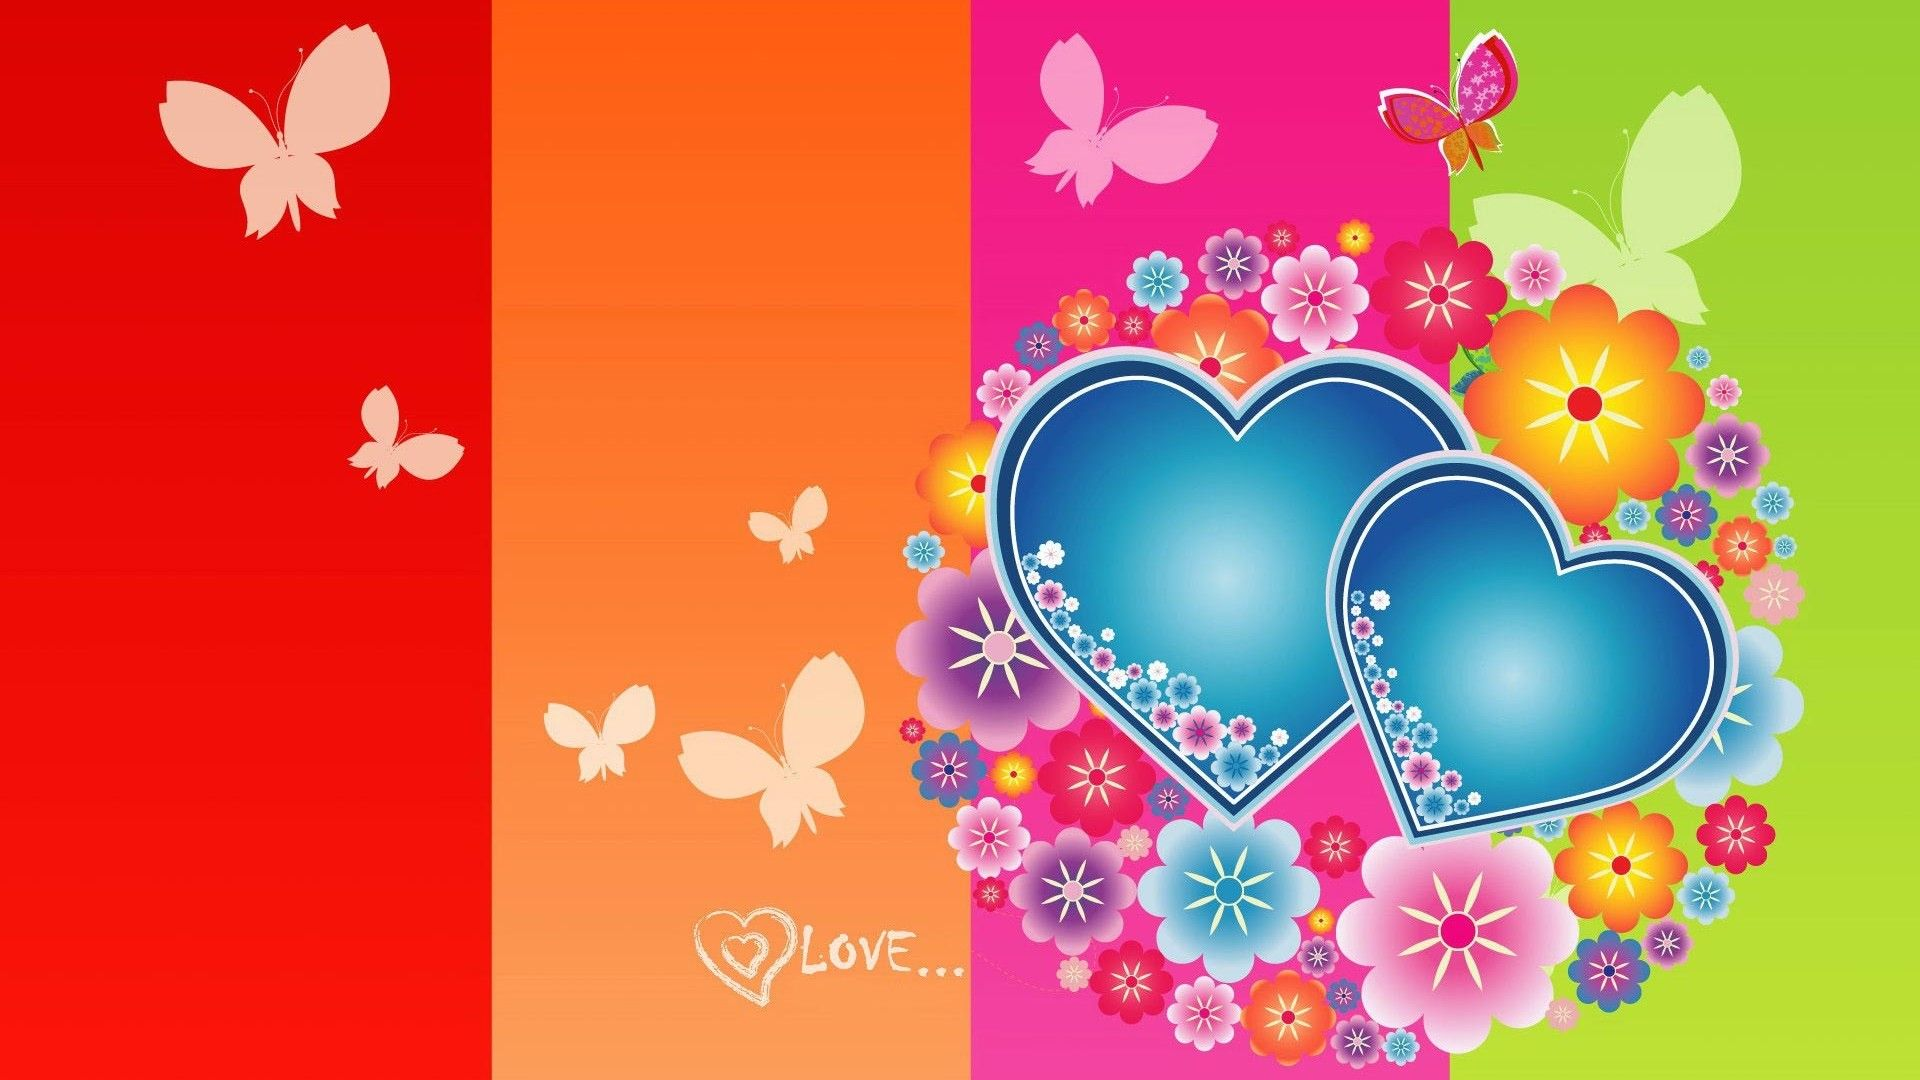 Cute Valentines Day 1920x1080 Hd Desktop Wallpaper